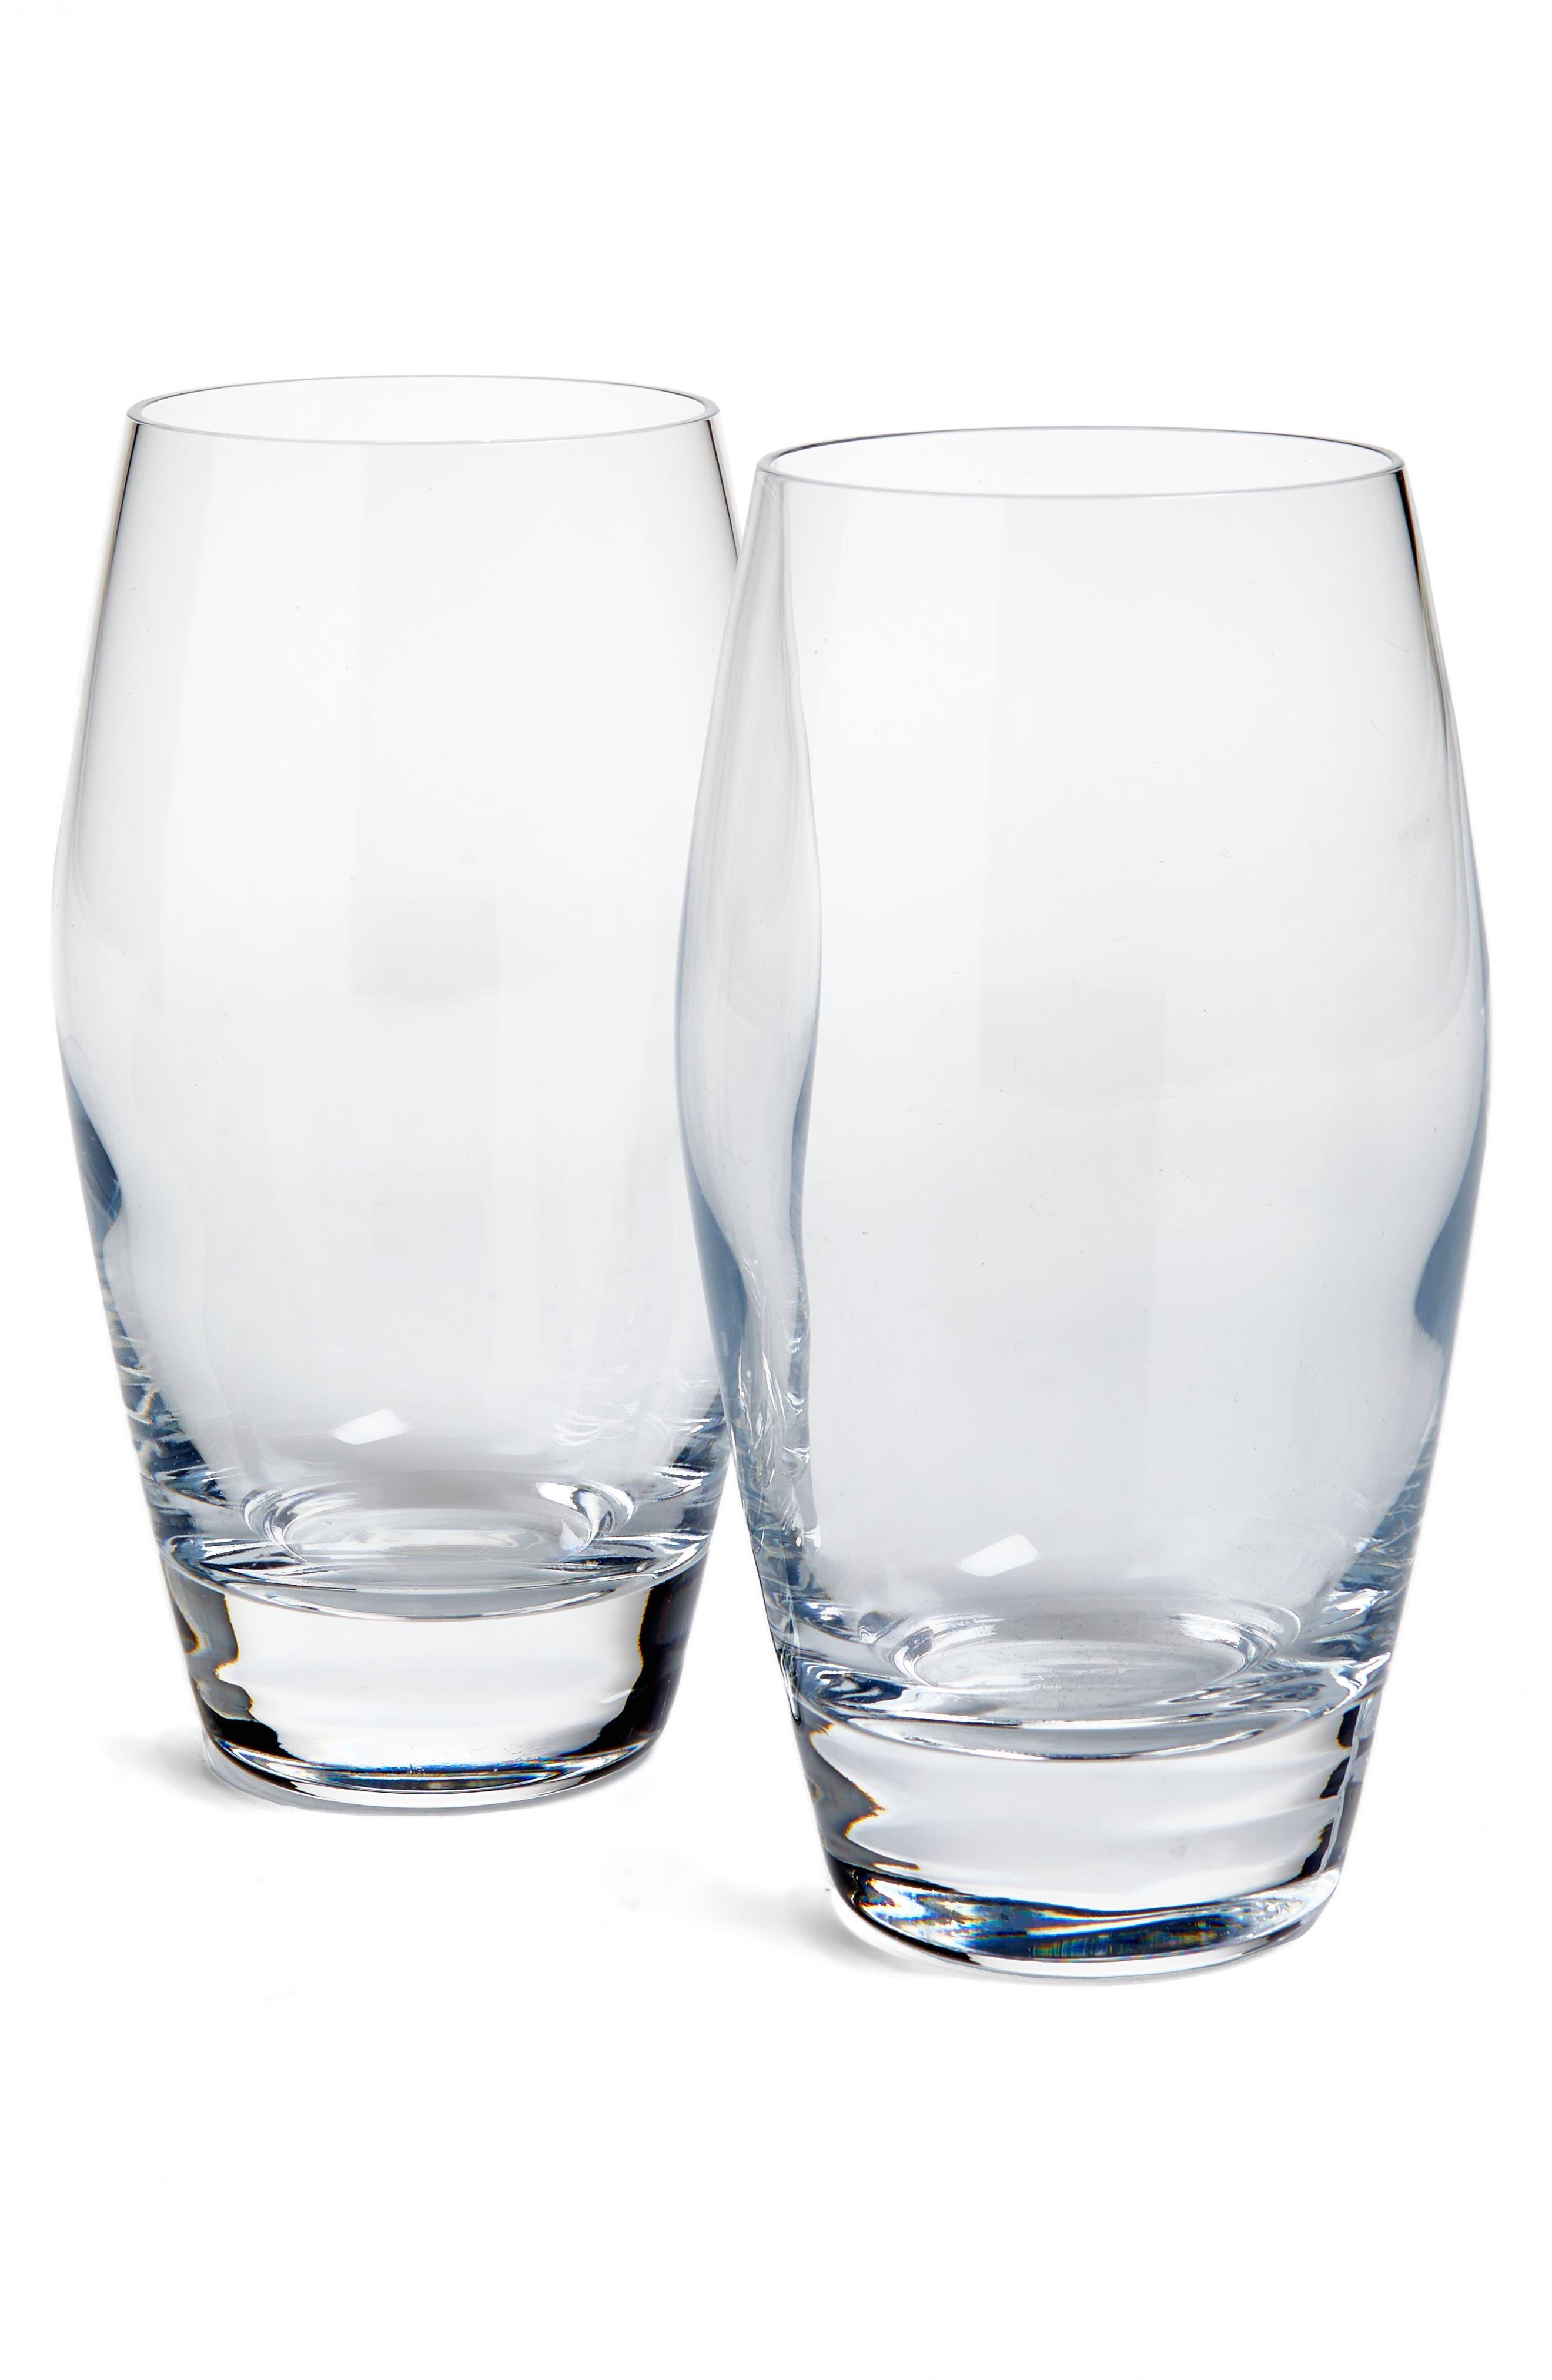 Classico Set of 4 Beverage Glasses,                             Main thumbnail 1, color,                             105